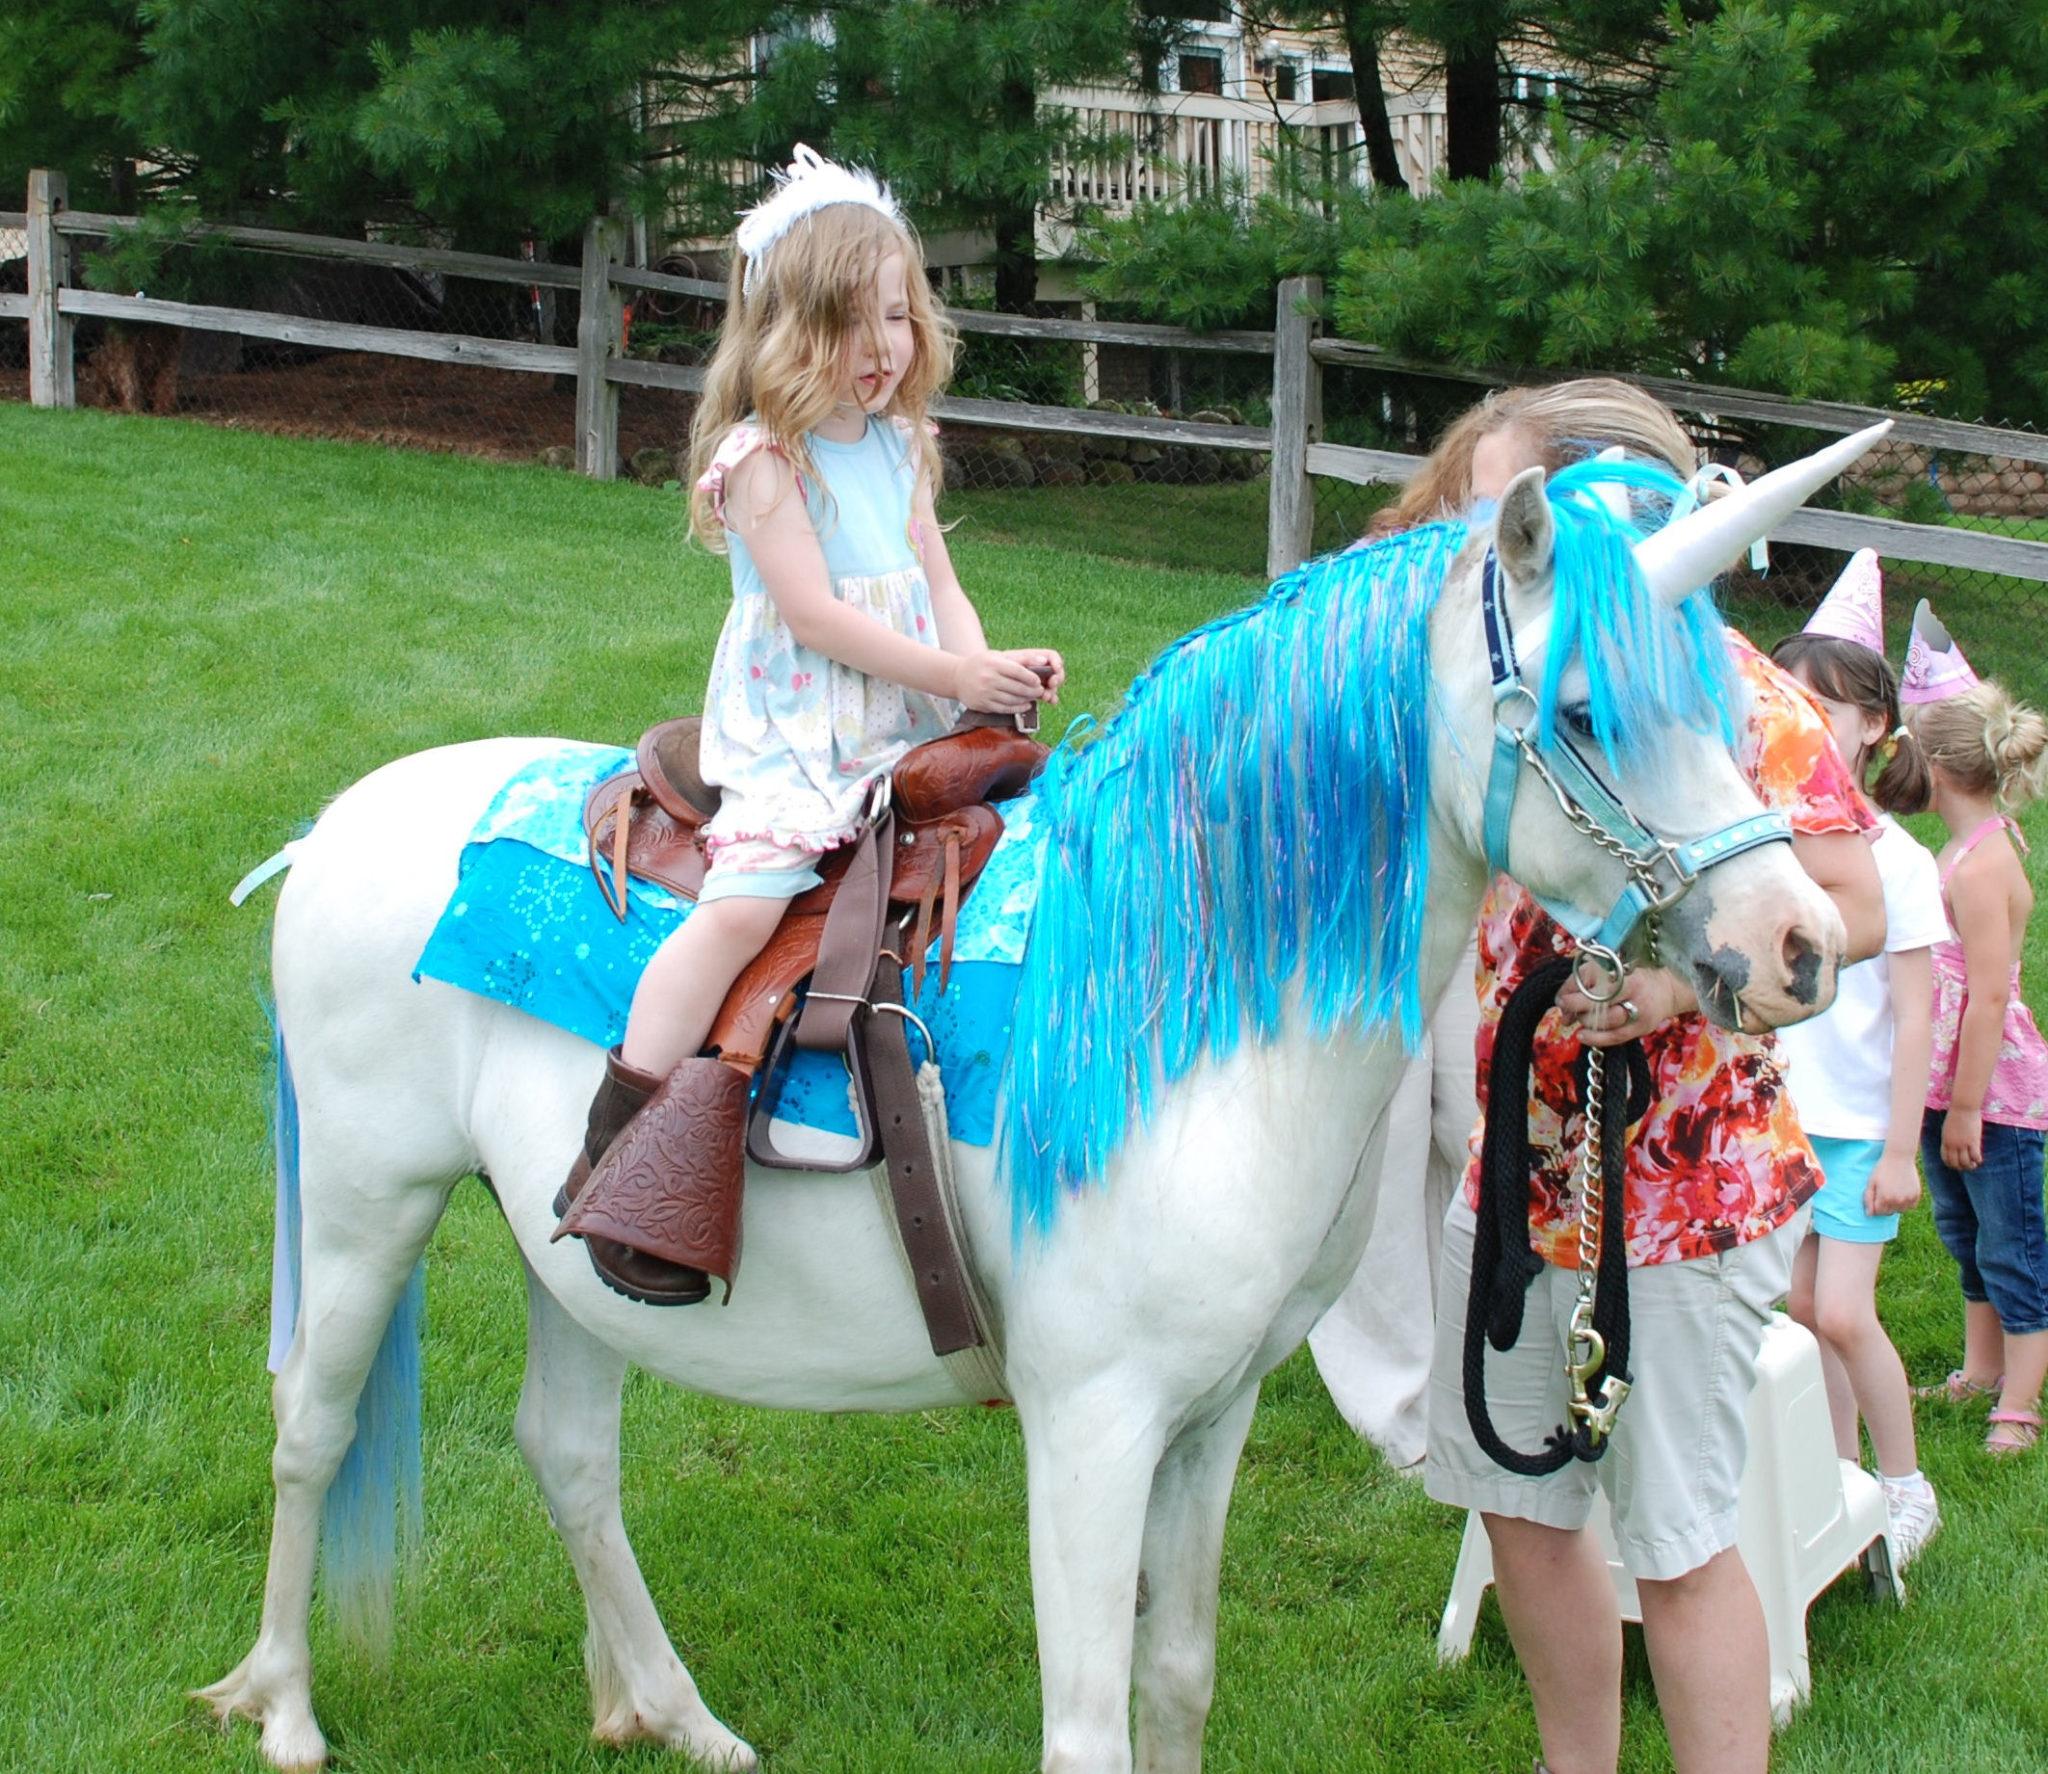 Horses Toys For Girls Birthdays : Mystical unicorn birthday party ideas for kids